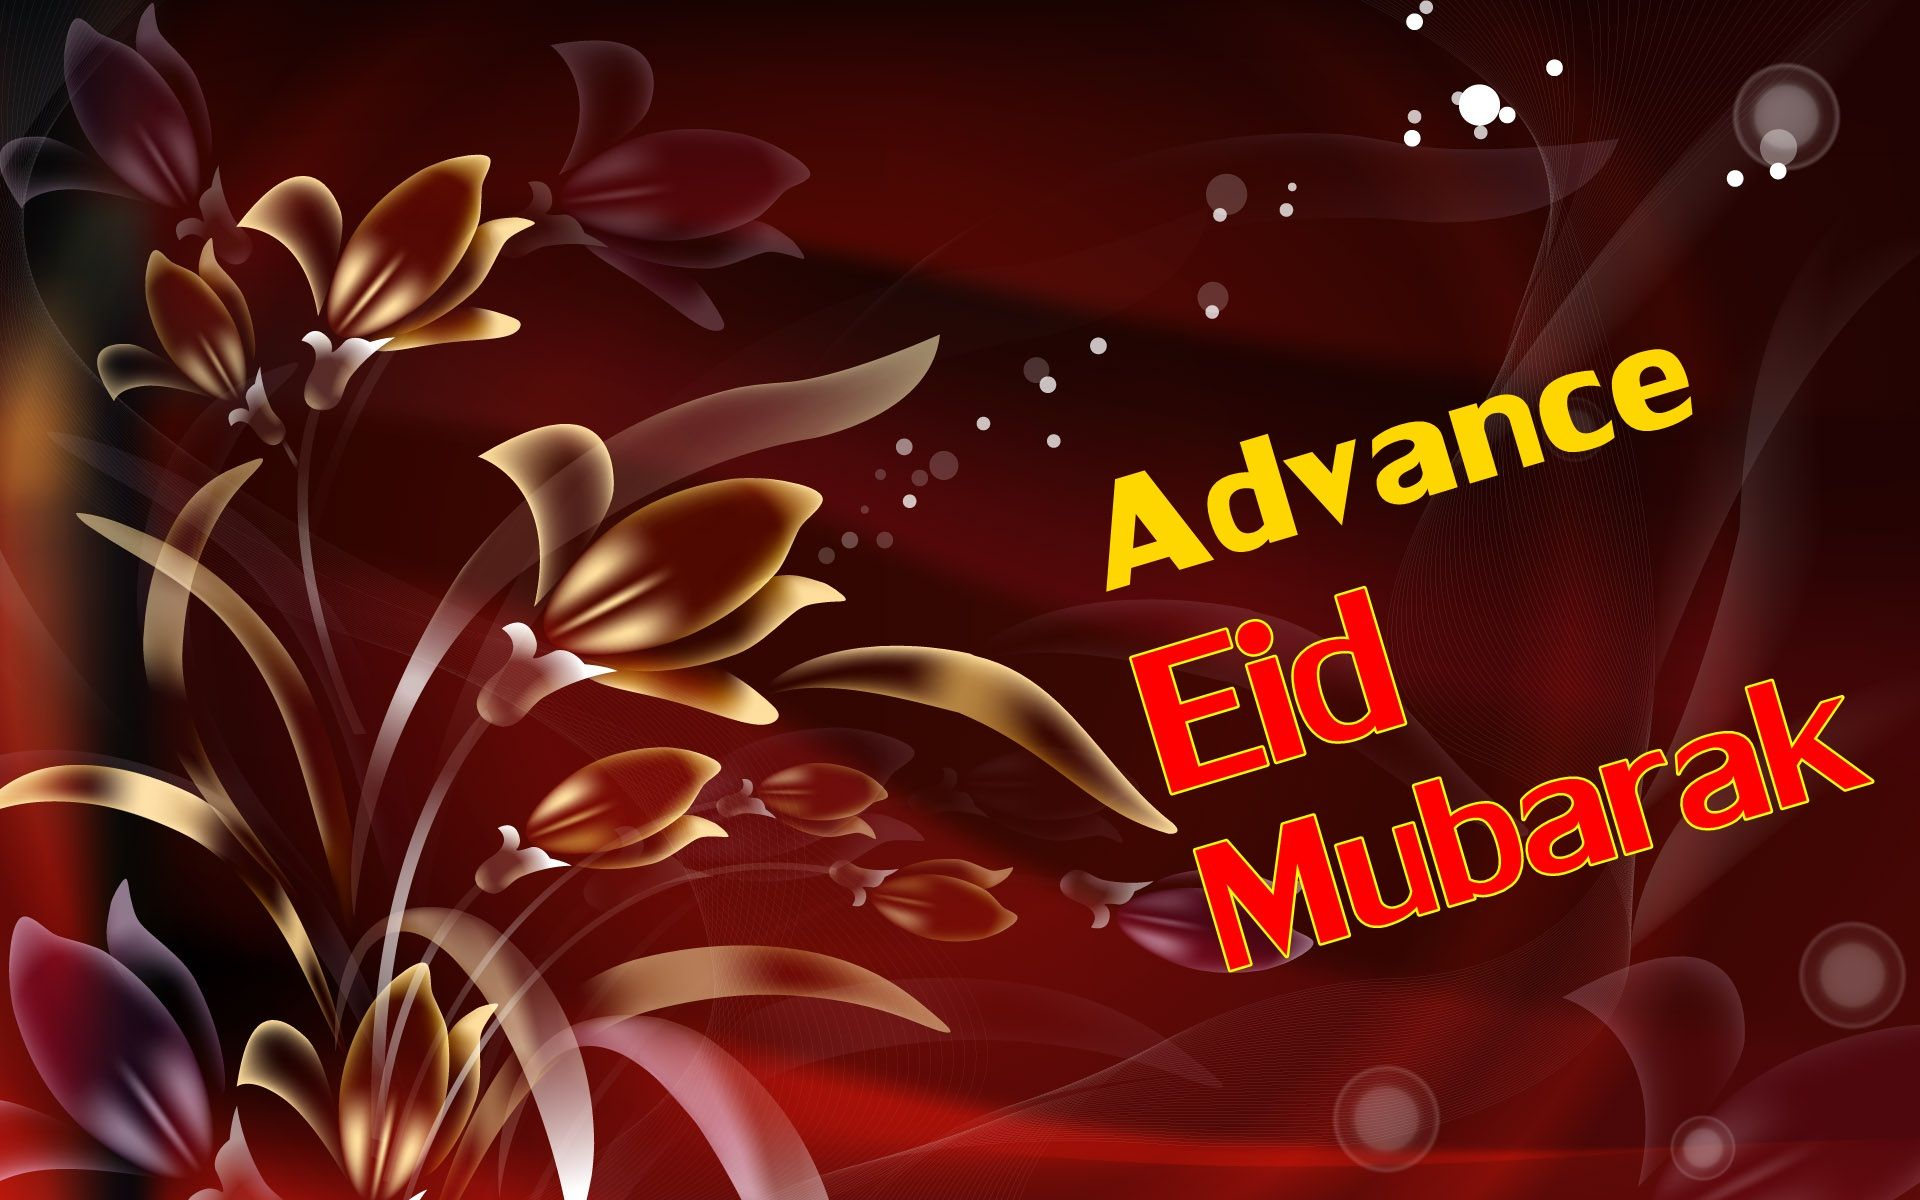 Advance eid mubarak images eid mubarak pinterest eid mubarak advance eid mubarak images kristyandbryce Images